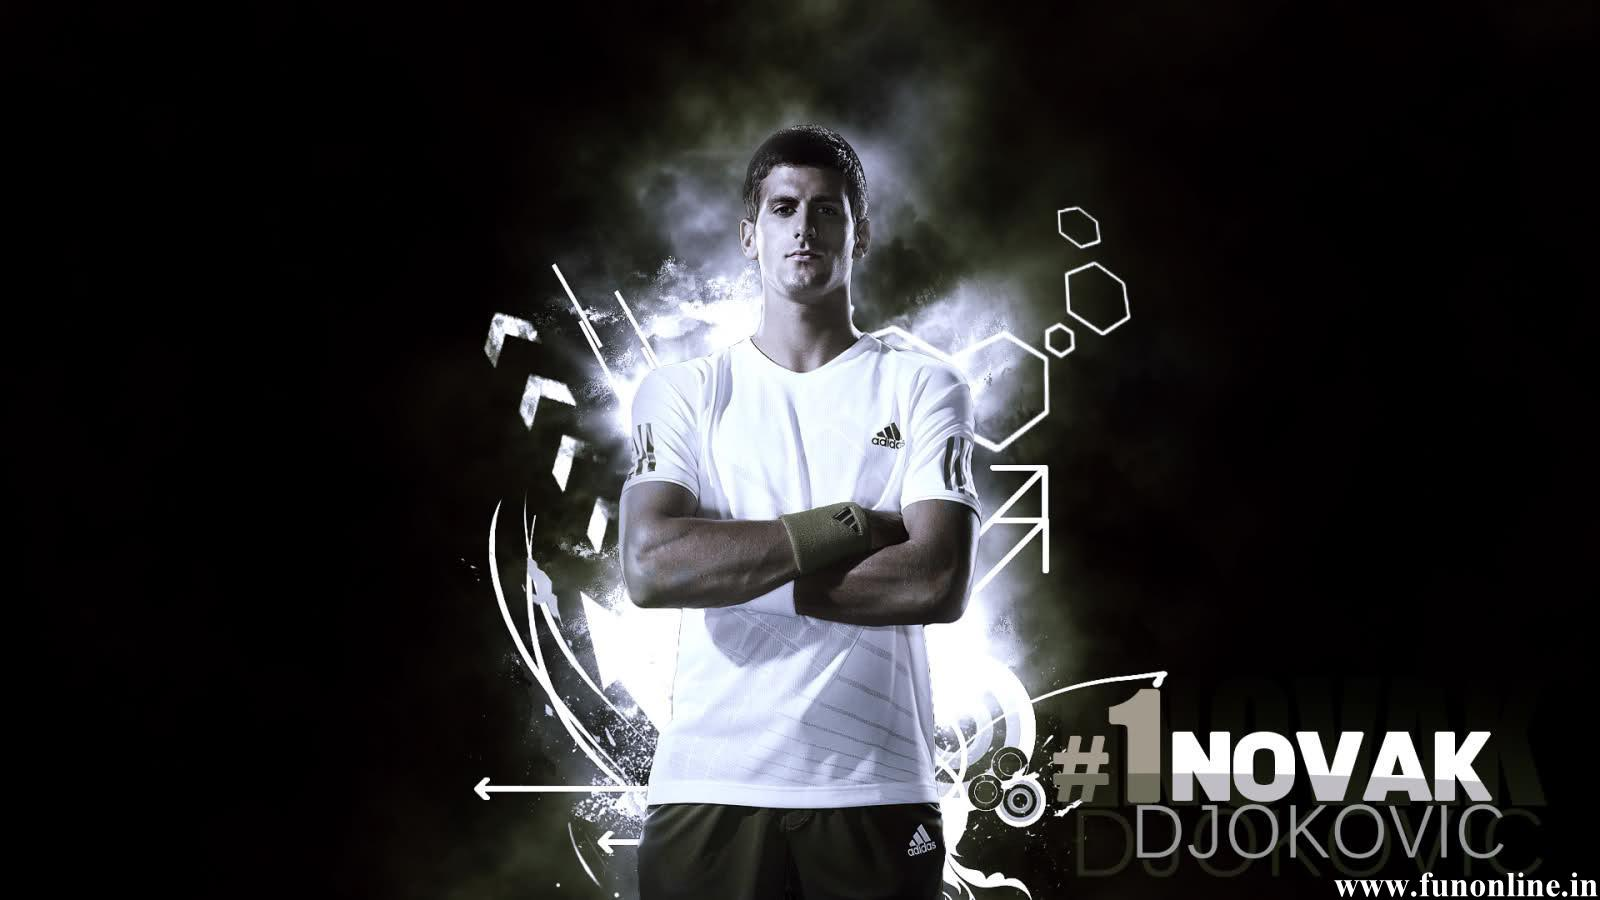 Djokovic Wallpapers Download Novak Djokovics HD Wallpaper 1600x900